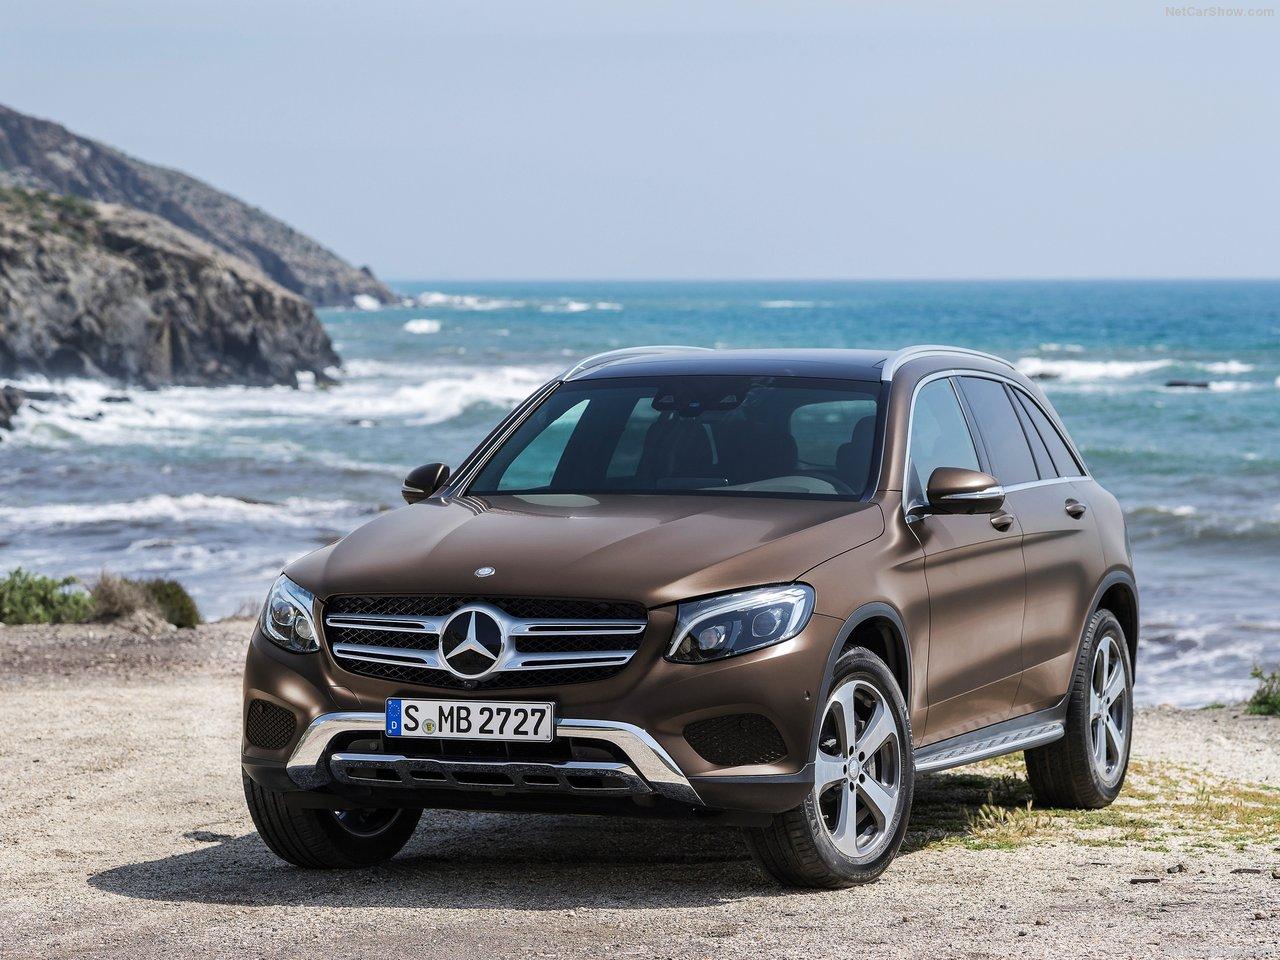 Mercedes-Benz-GLC_2016_1280x960_wallpaper_01